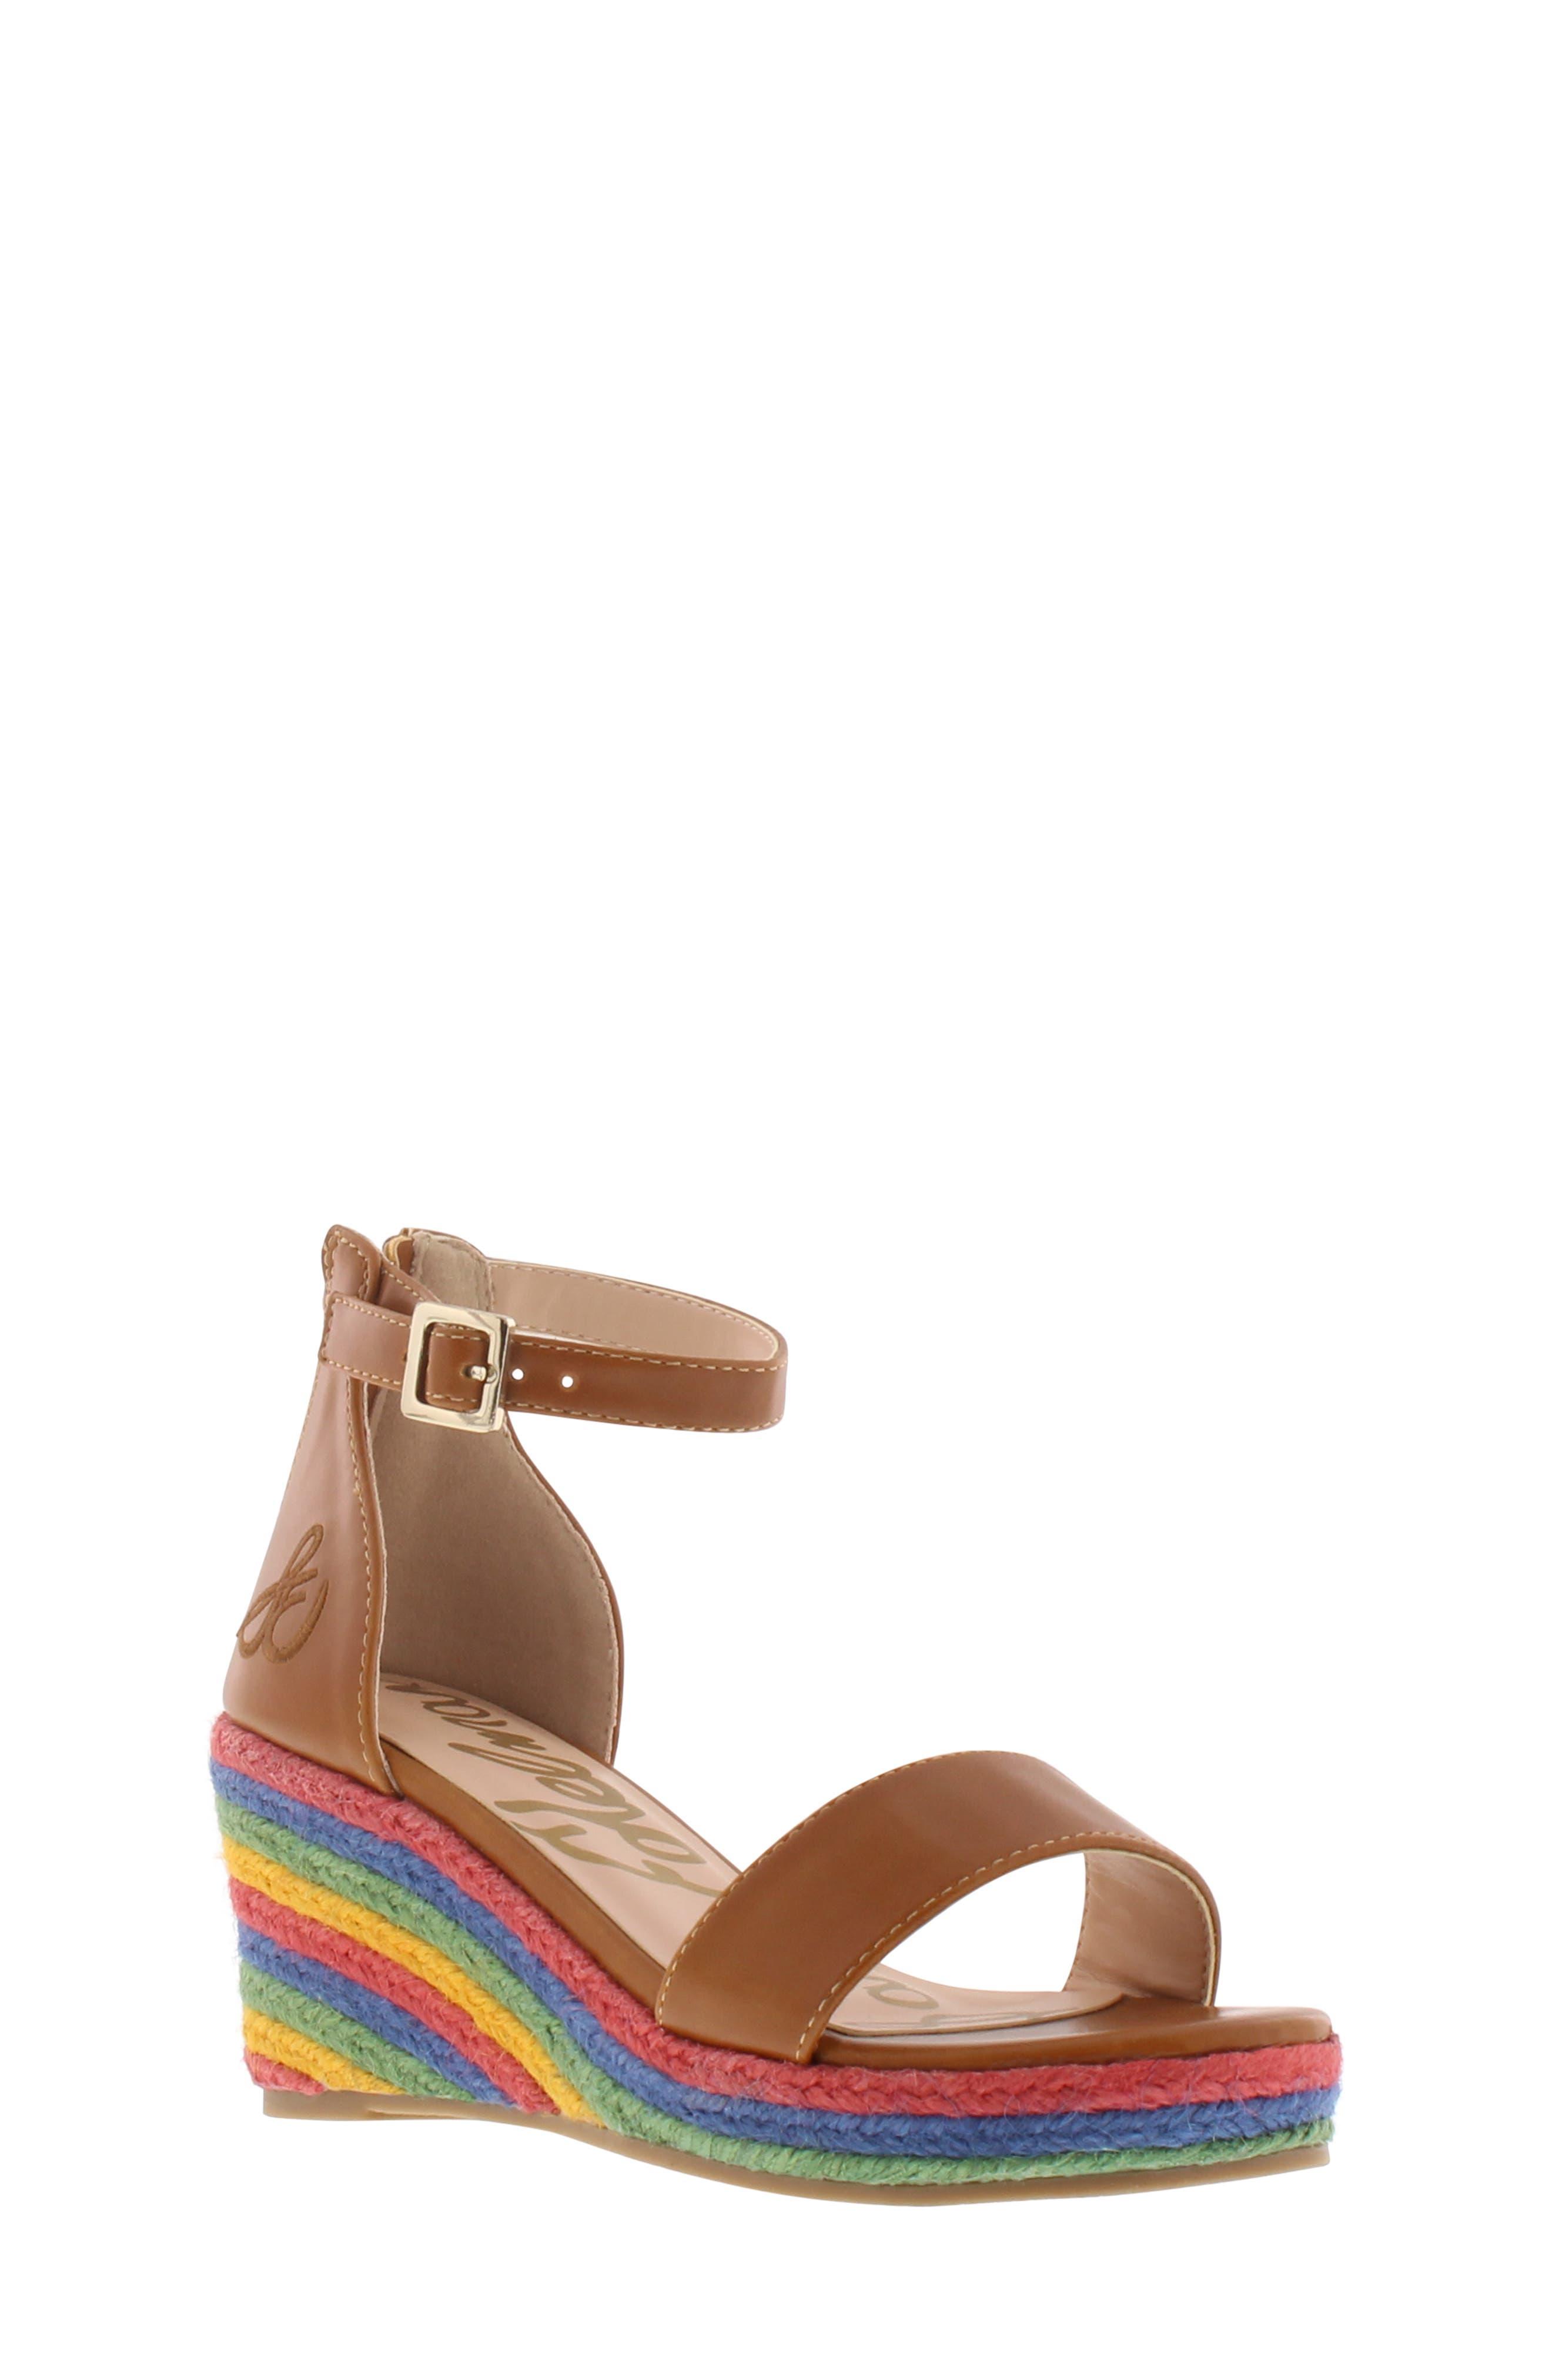 Azalia Ray Wedge Sandal, Main, color, SADDLE